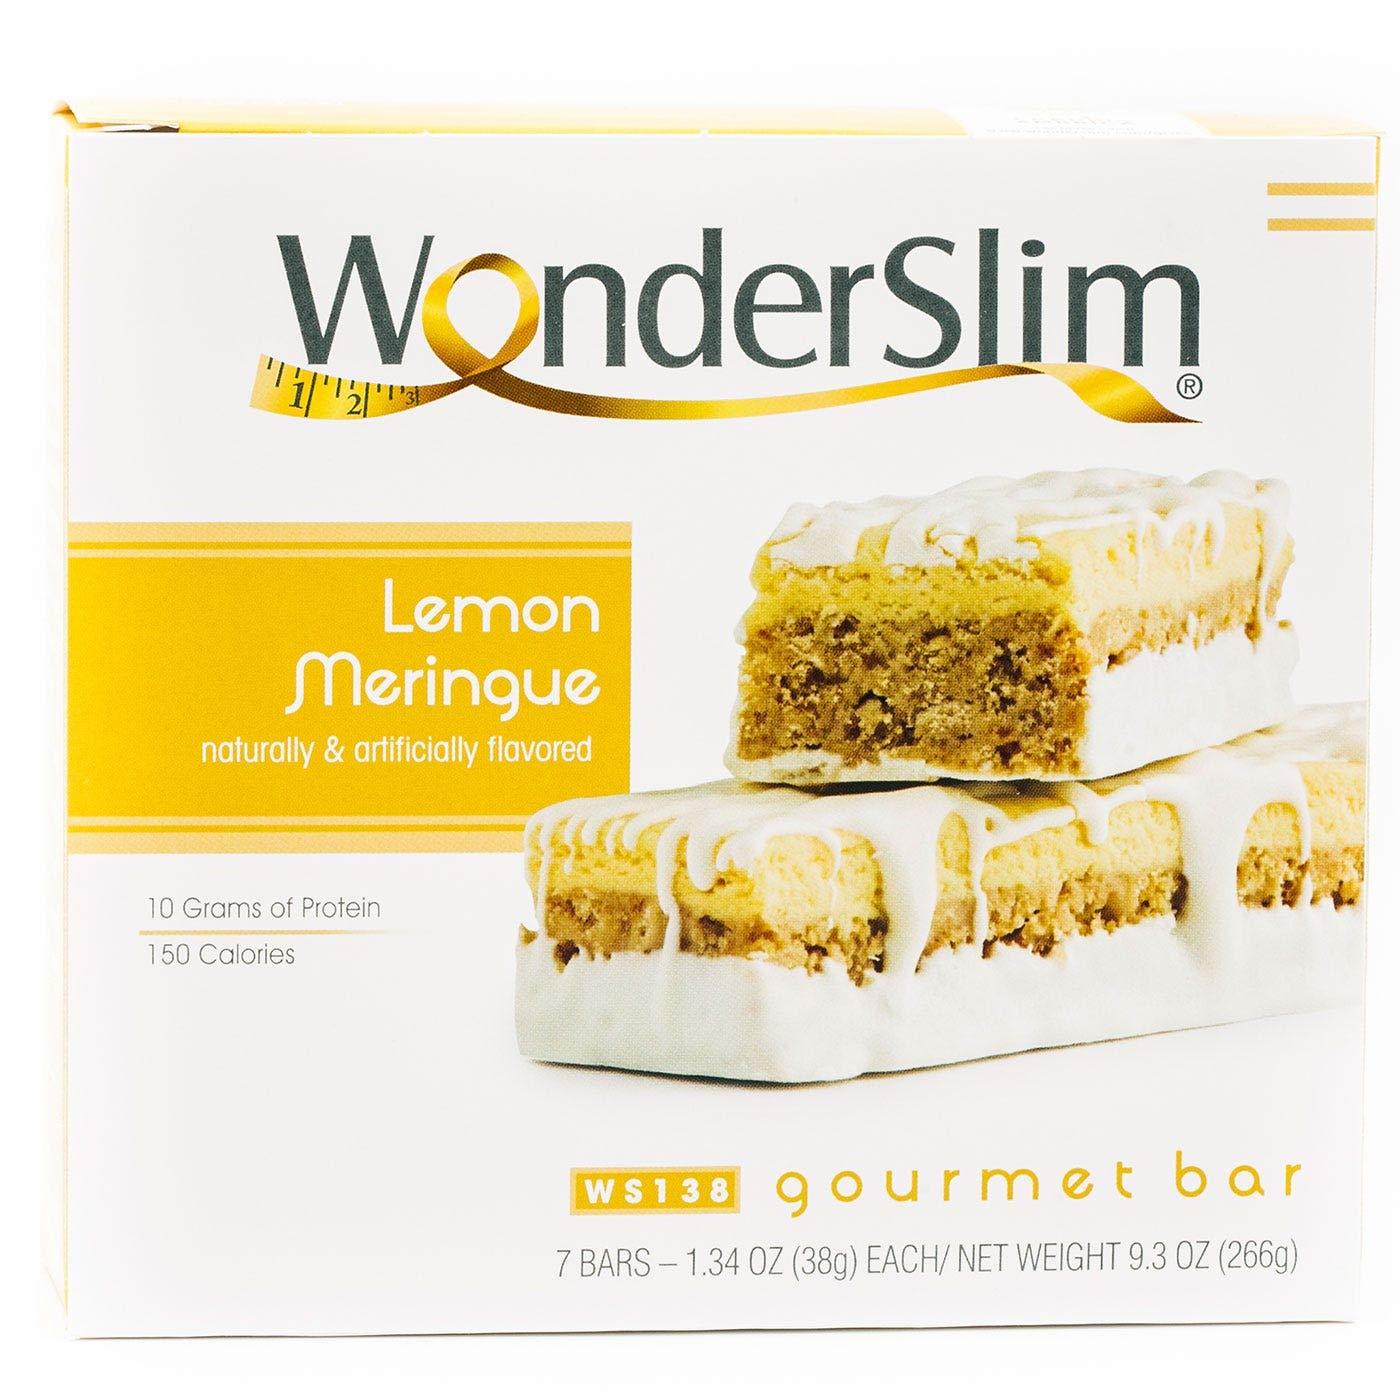 WonderSlim Gourmet High Protein Bar/Diet Bars with 10g Protein - Trans Fat Free, Cholesterol Free, Lemon Meringue (7 Count)